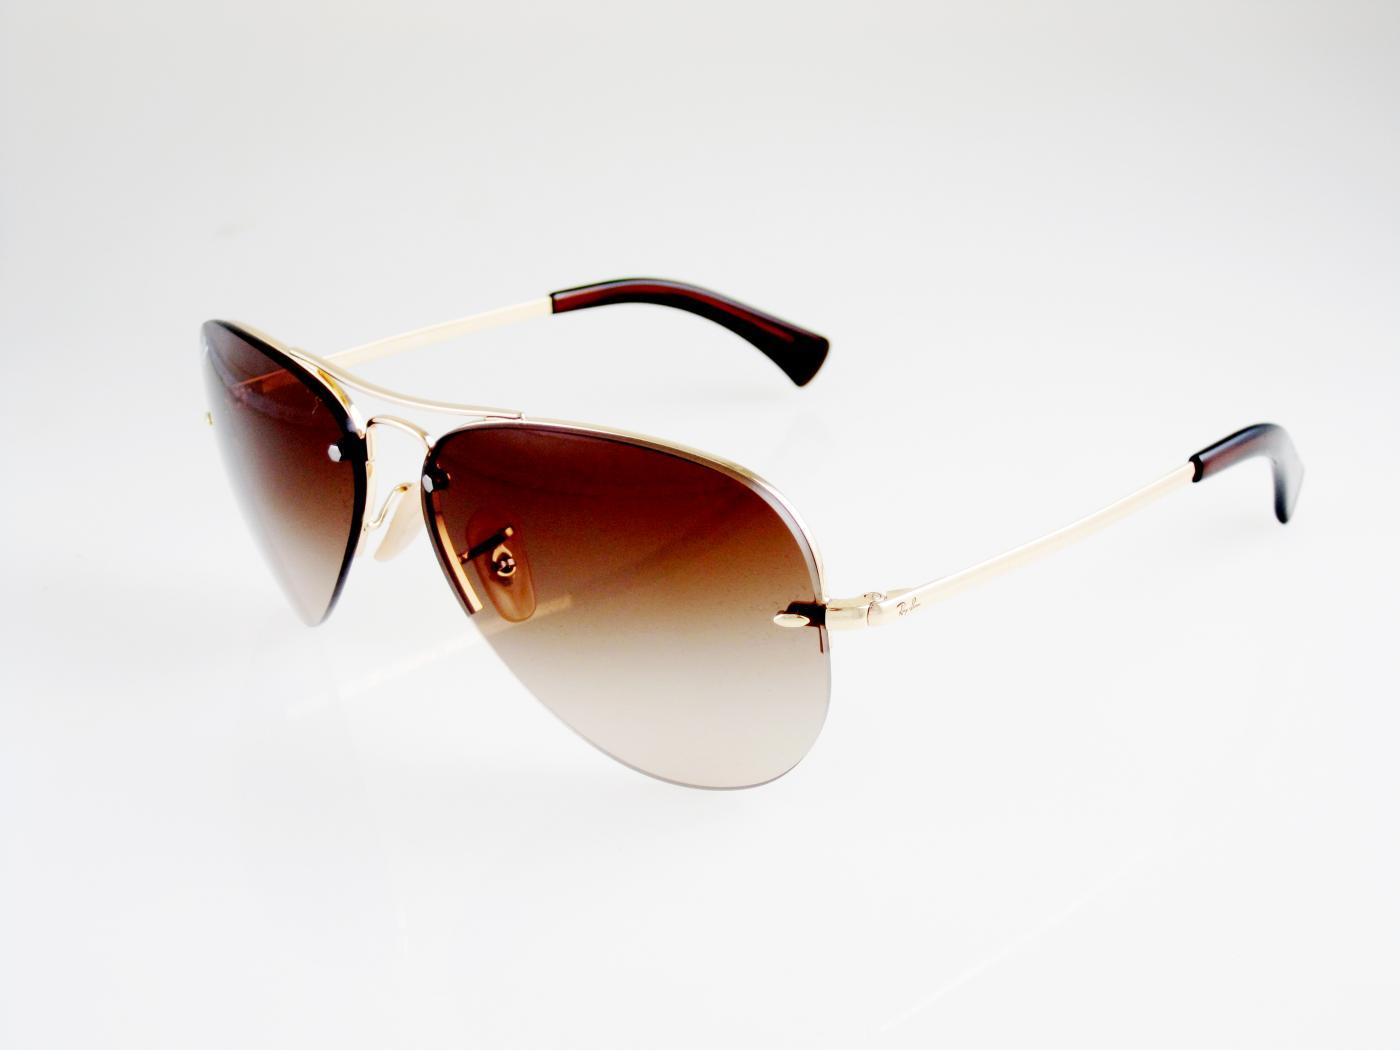 b1c8e5bca Unisex slnečné okuliare Ray Ban - Aviator | oftalens.sk